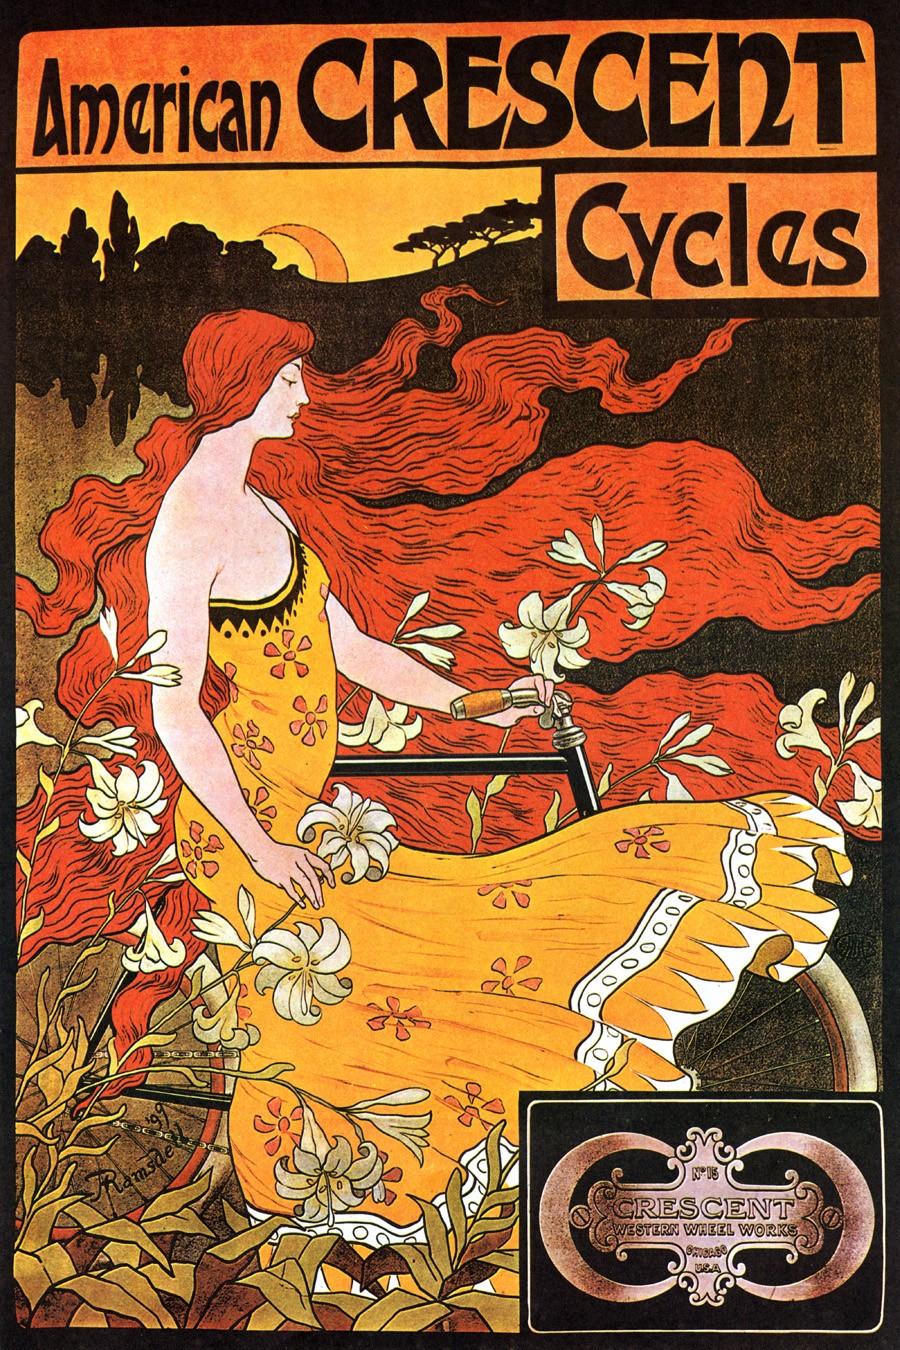 Foto 1 - Cycles American Crescent Garota Ruiva BicicletaVintage Cartaz Poster em Papel Matte